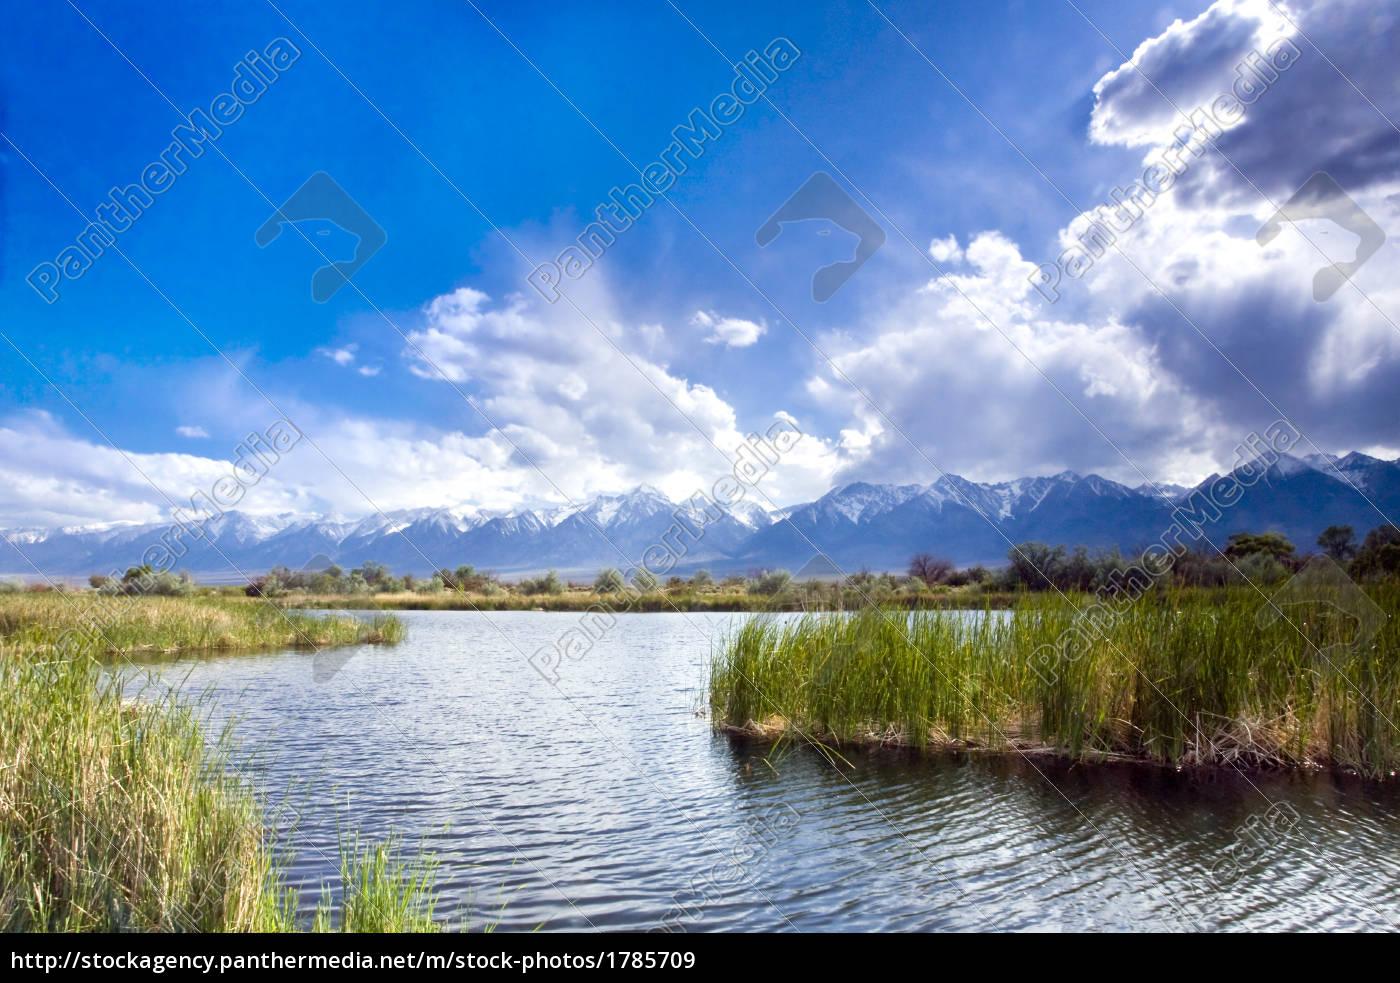 sierra, pond - 1785709